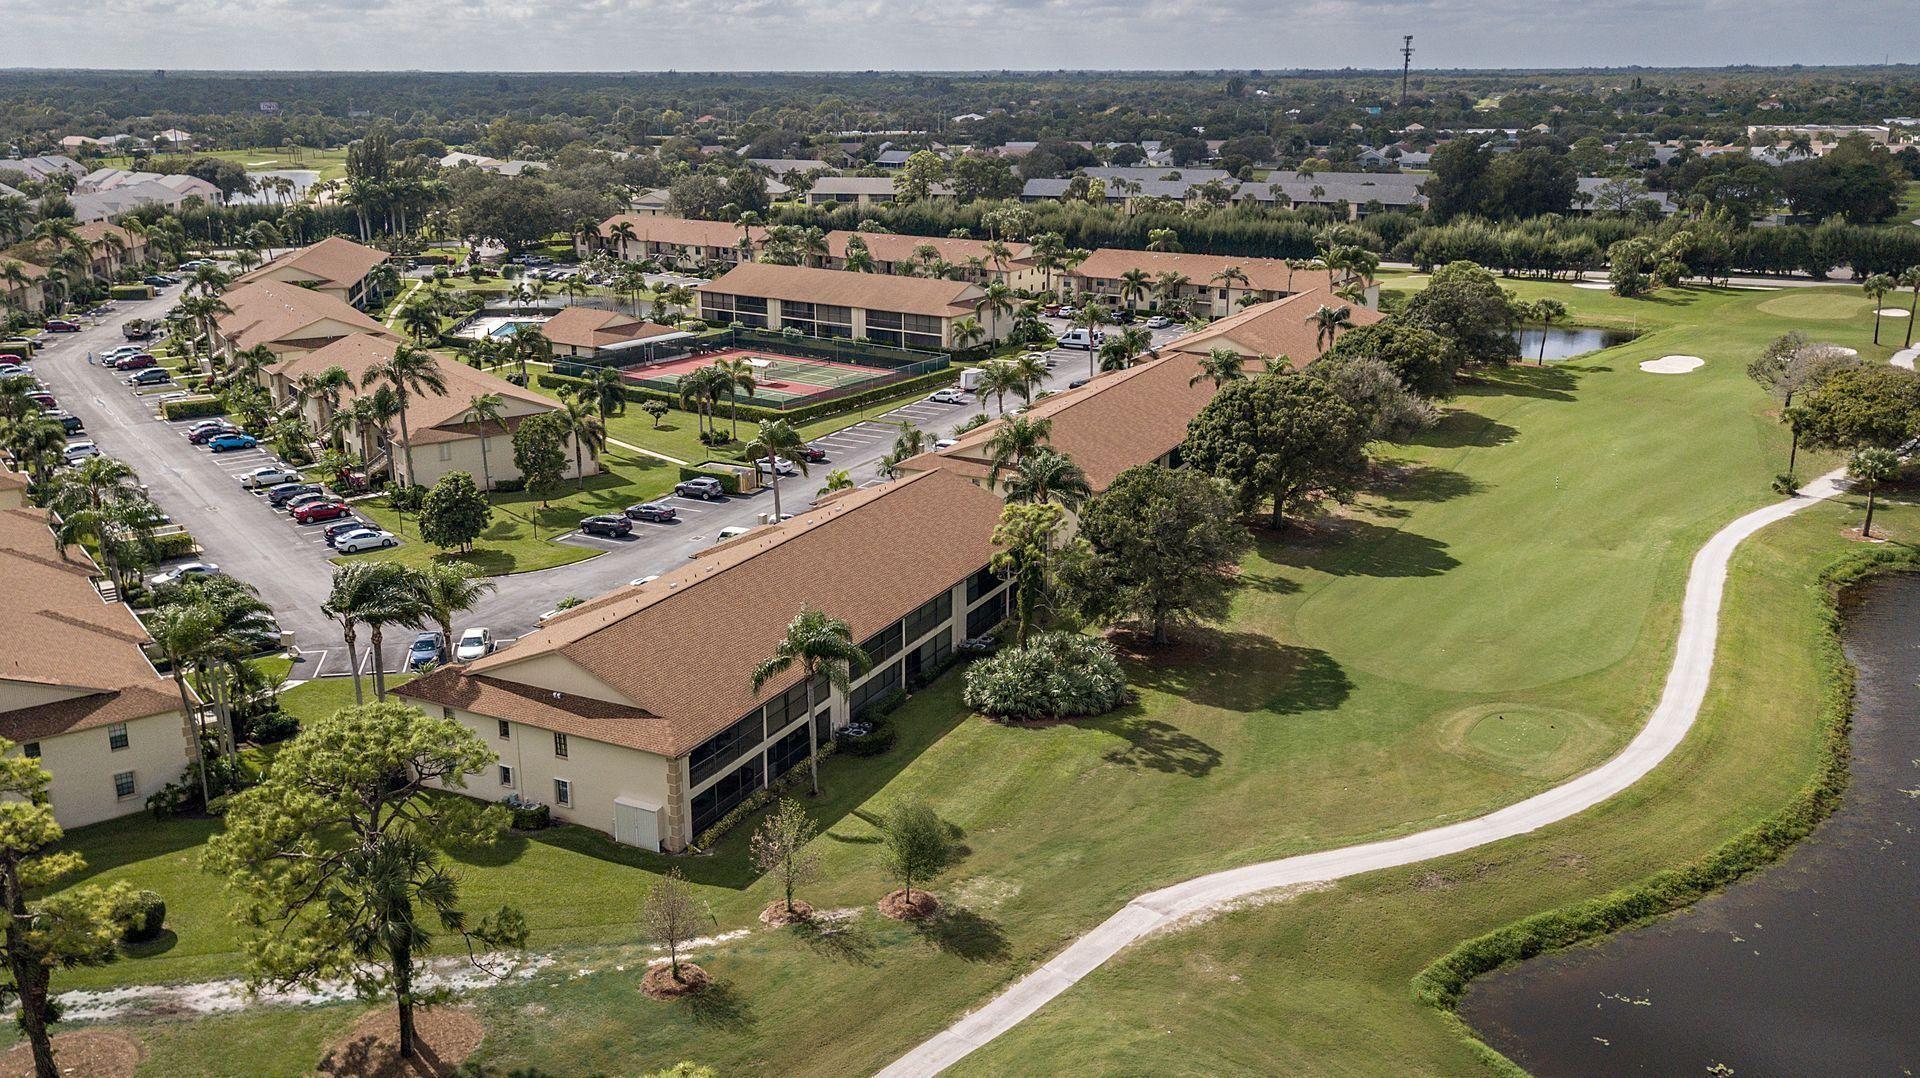 702 Pinecrest Circle #A, Jupiter, FL 33458 - MLS#: RX-10667458